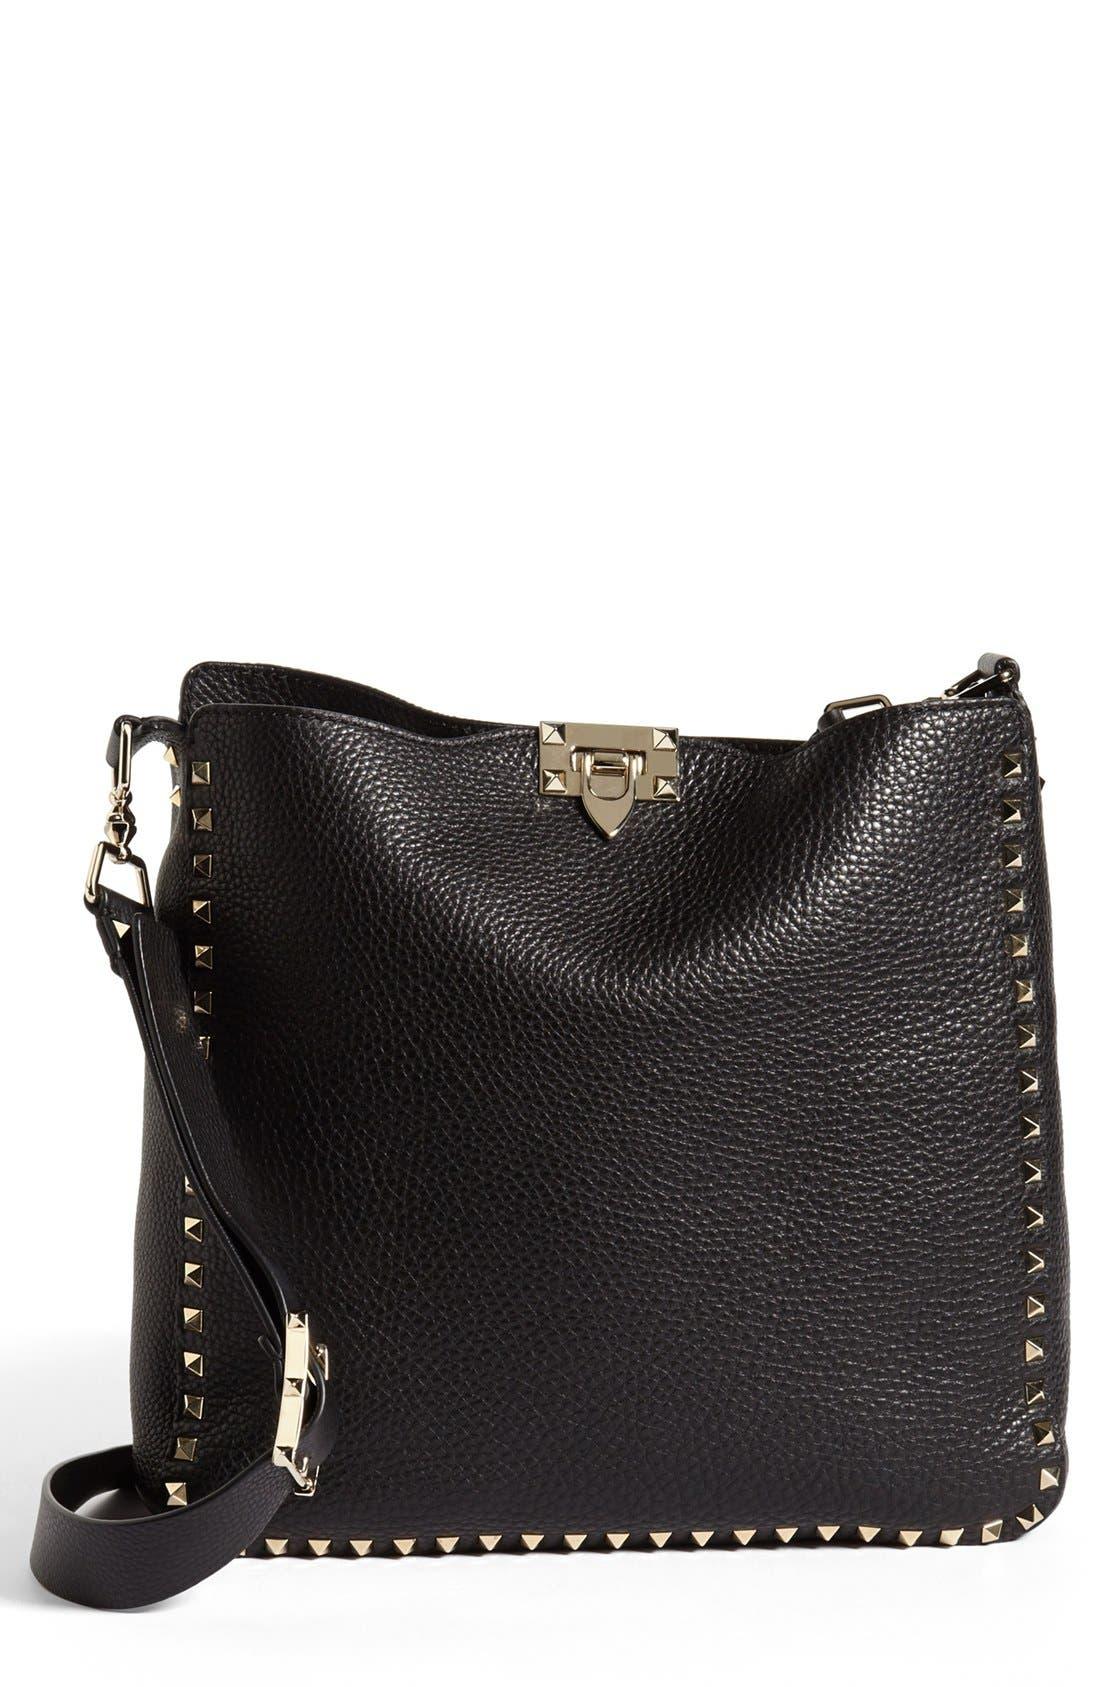 Alternate Image 1 Selected - Valentino 'Rockstud' Crossbody Bag